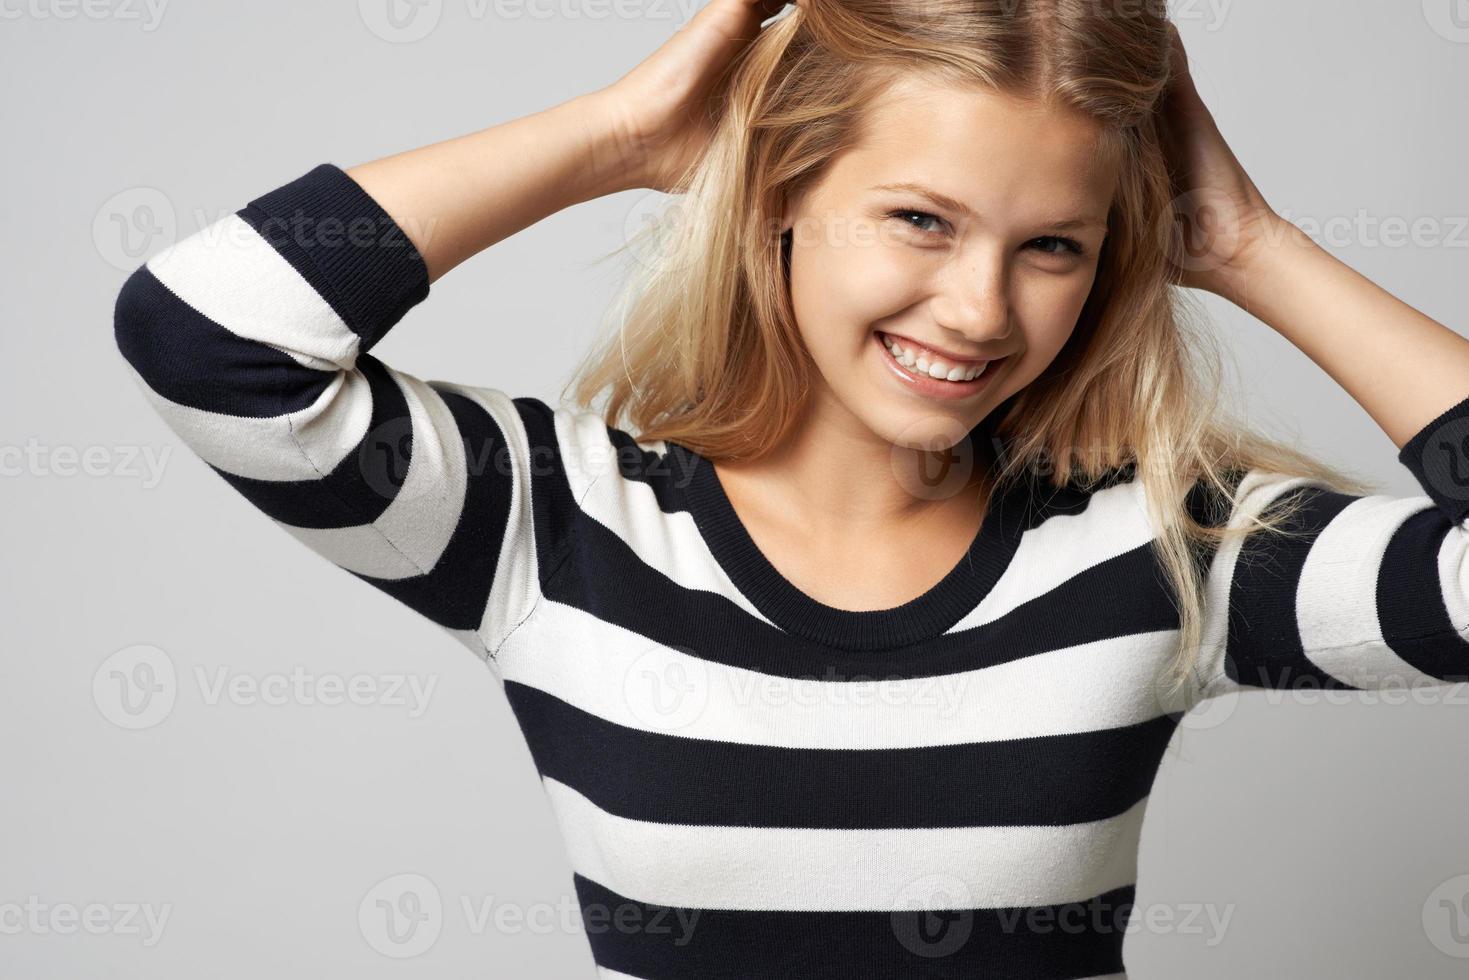 beautiful girl in a striped sweater cute smiling photo